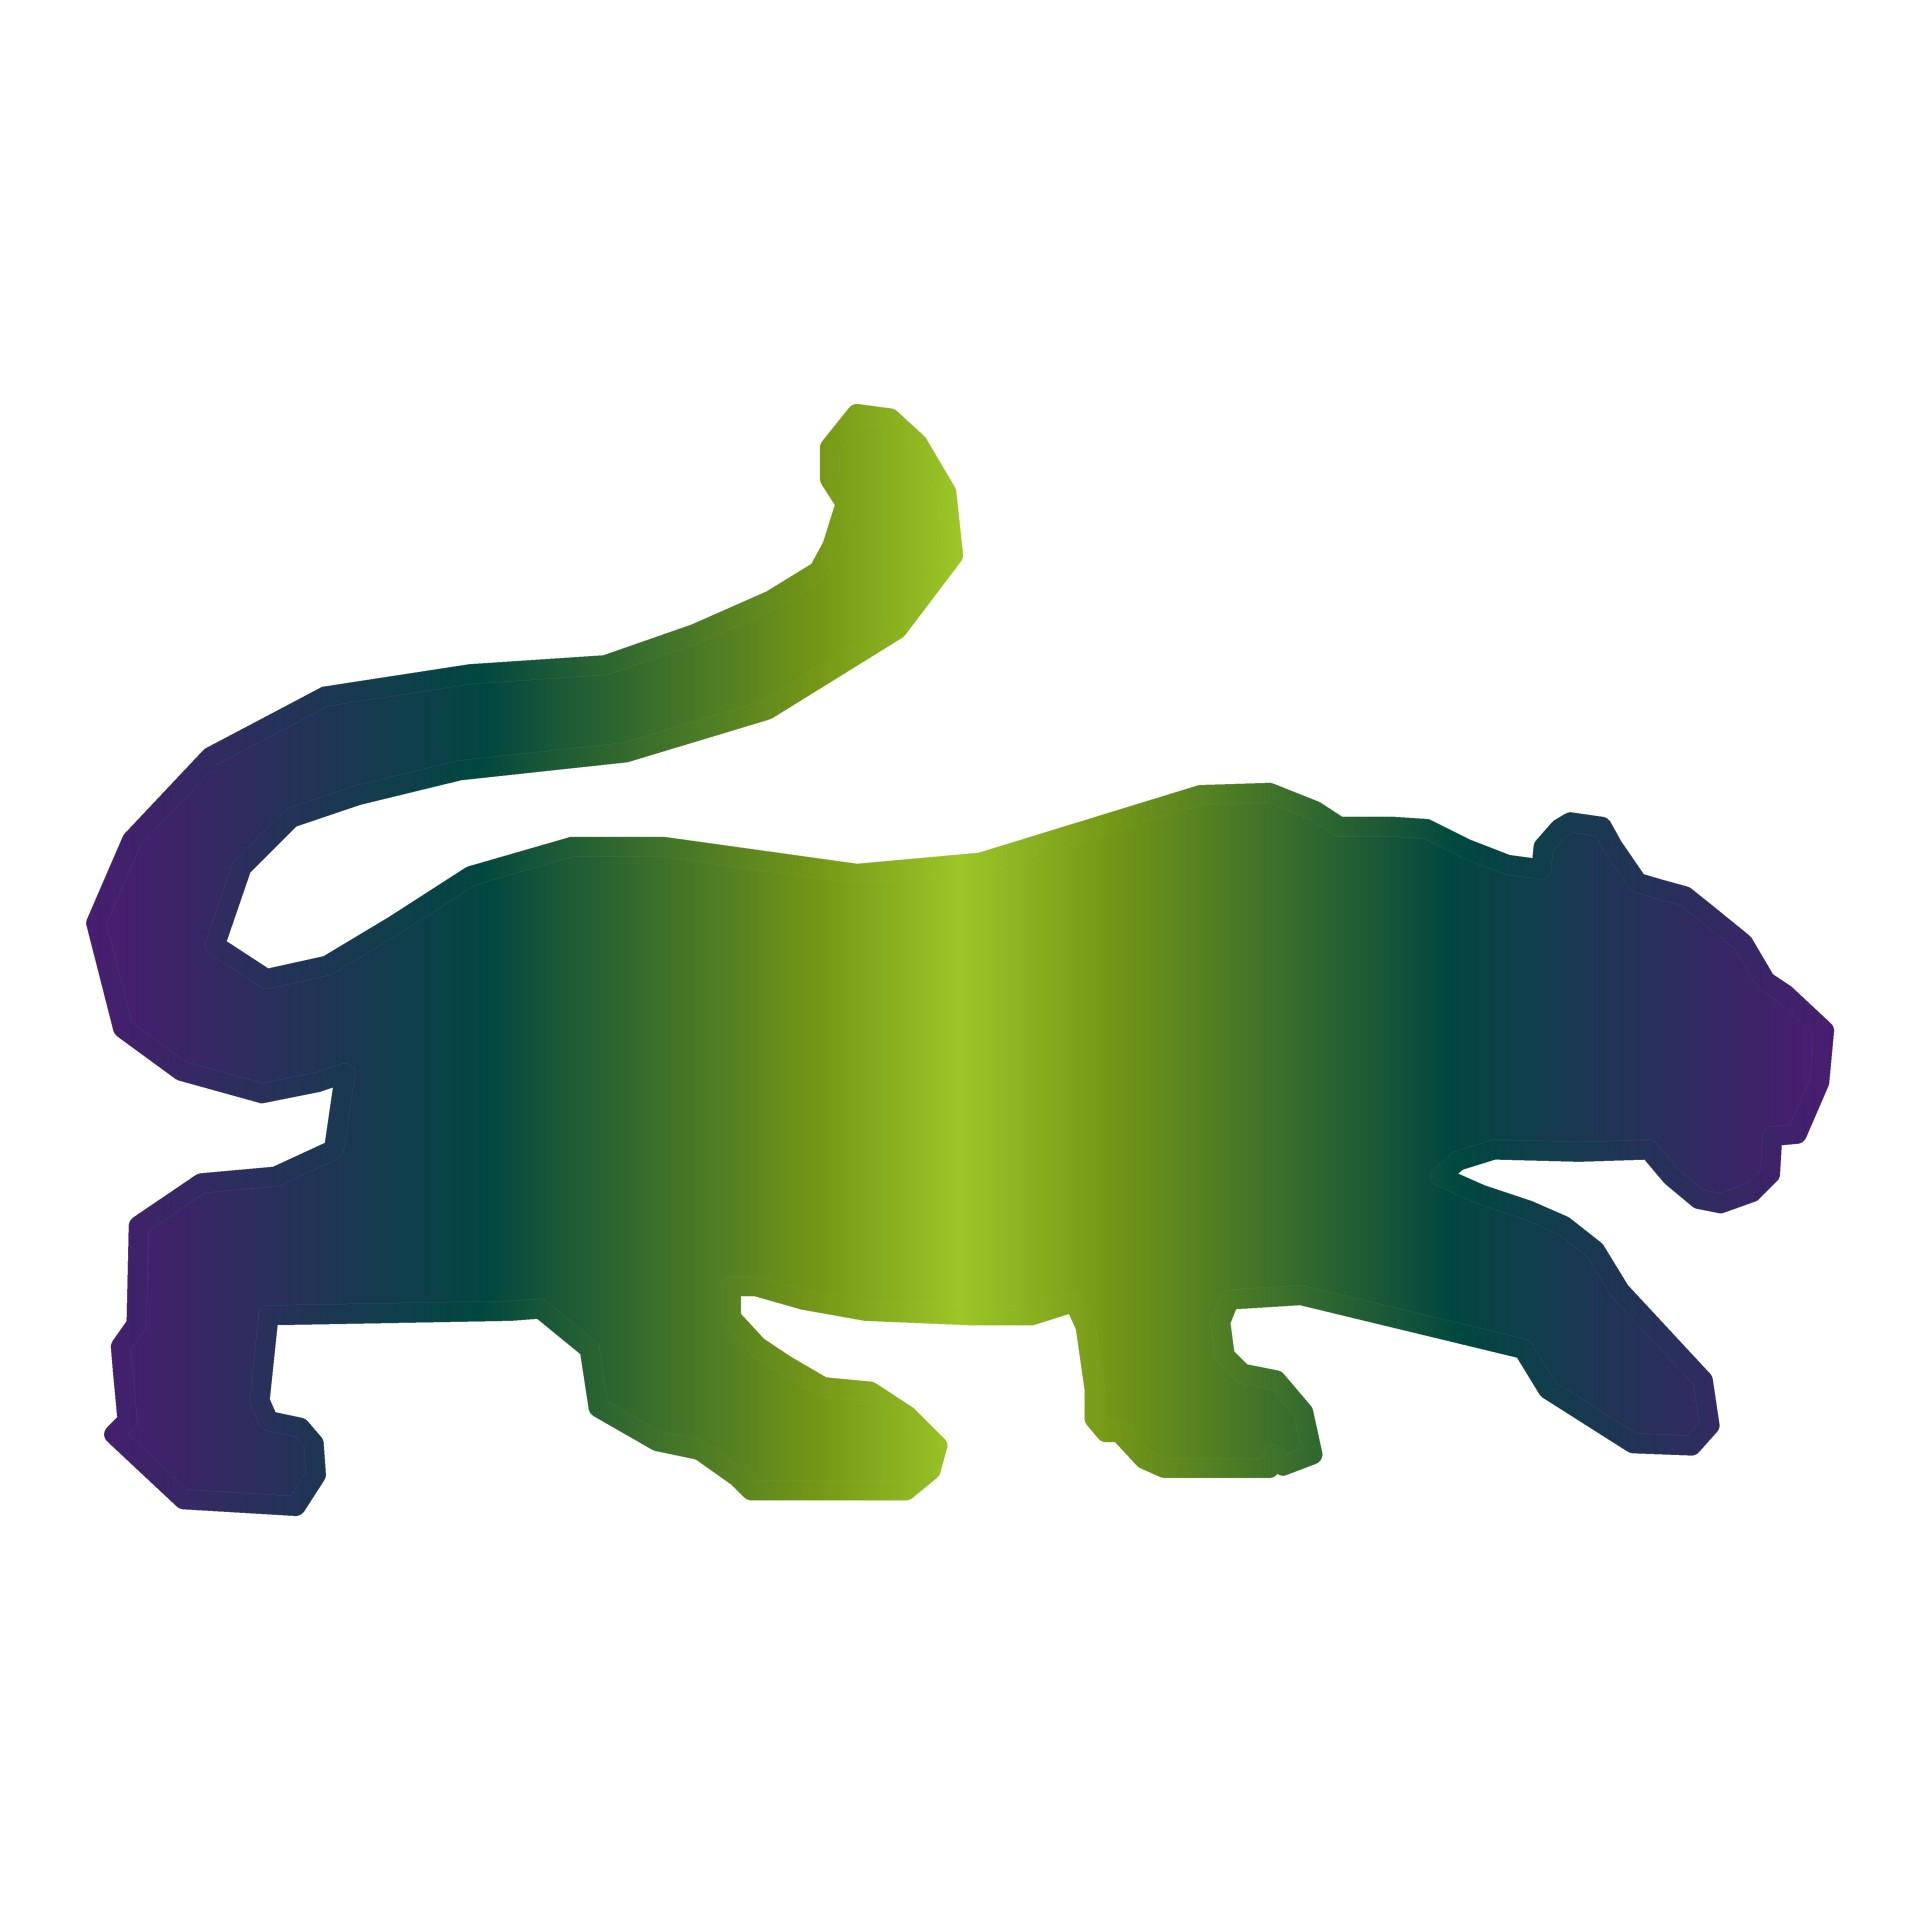 1920x1920 Tiger Green Silhouette Free Stock Photo